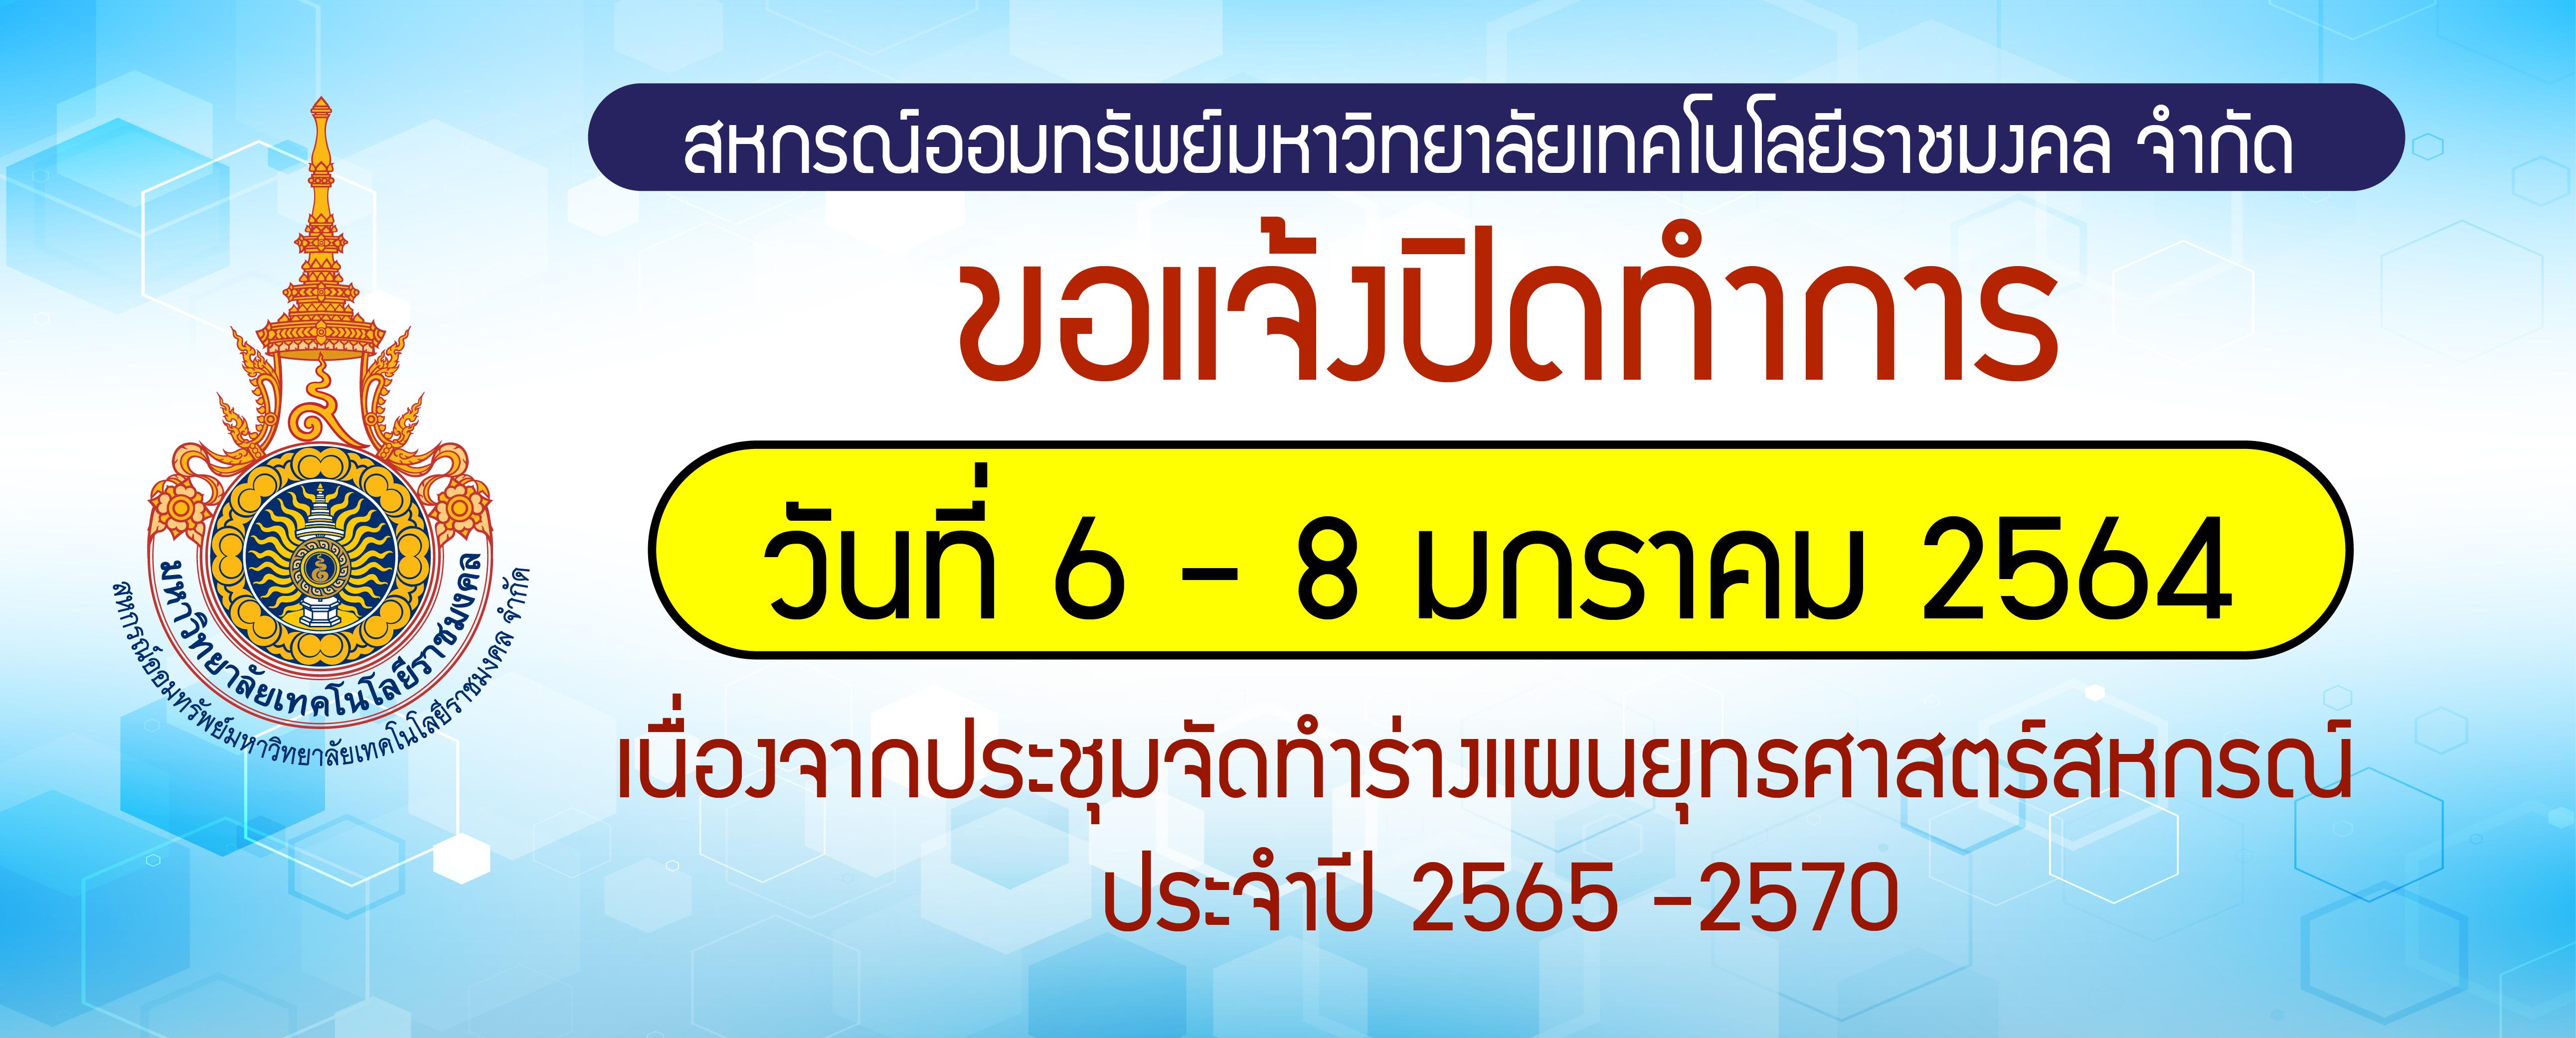 banner-26122563-01